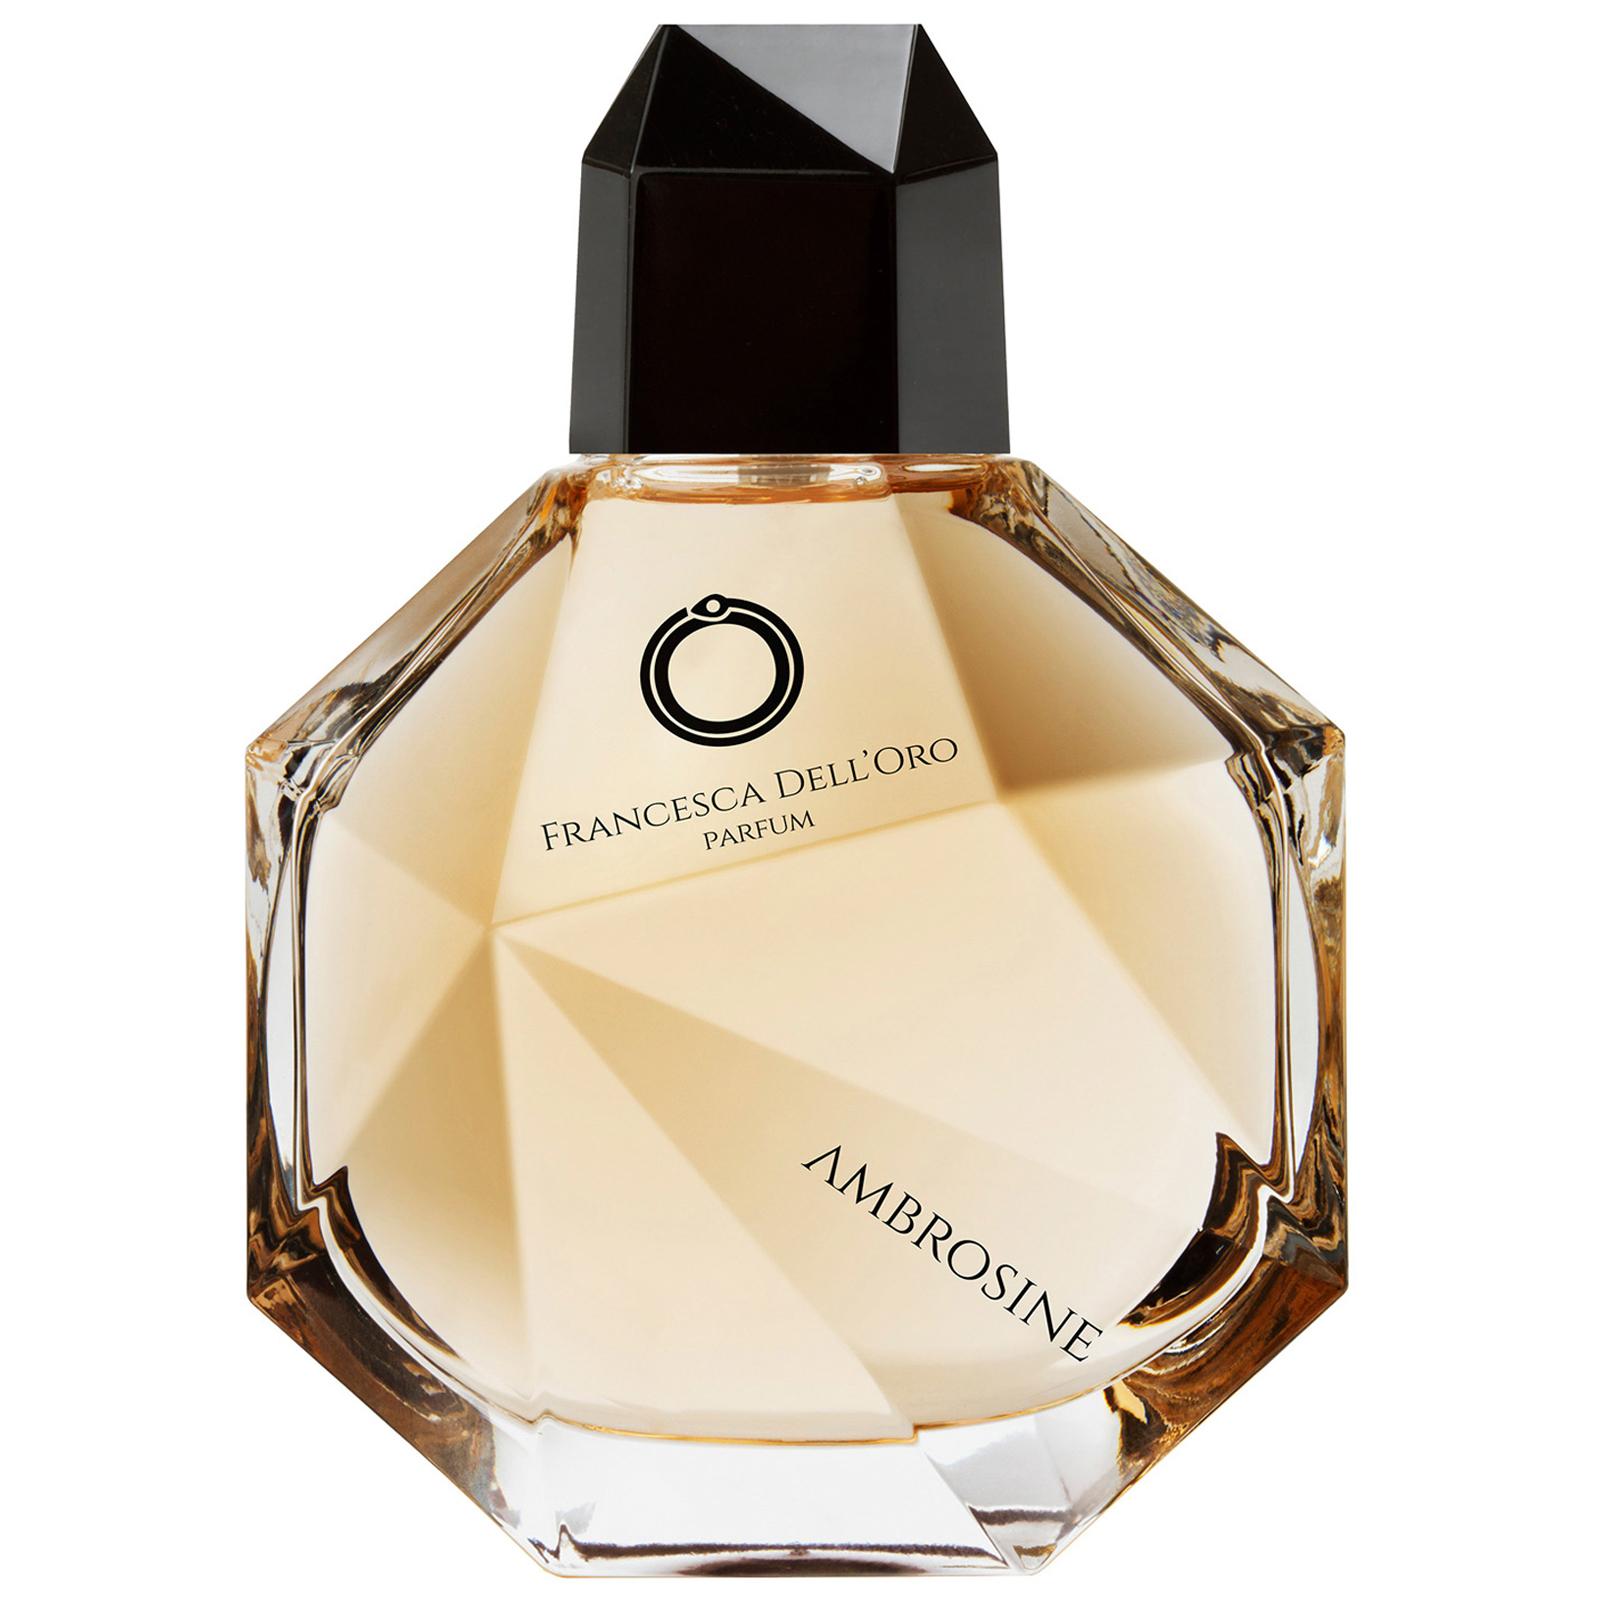 Ambrosine profumo eau de parfum 100 ml